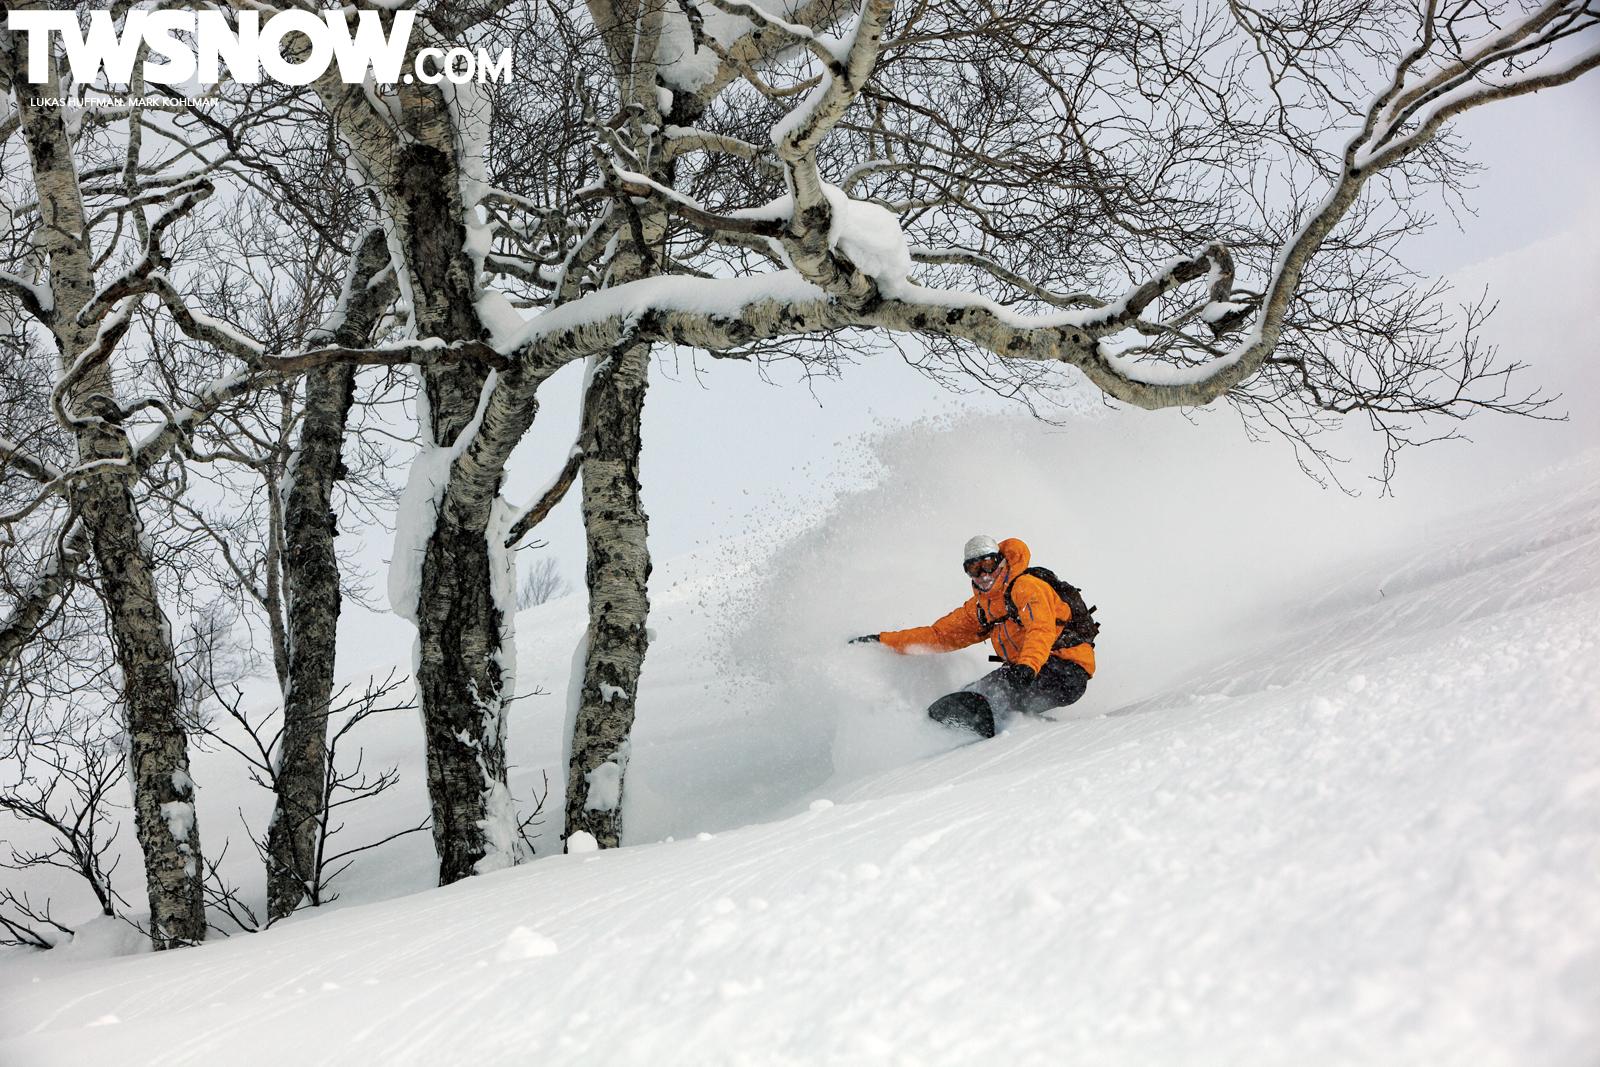 Wallpaper Wednesday Powder Surfing in Japan TransWorld SNOWboarding 1600x1067